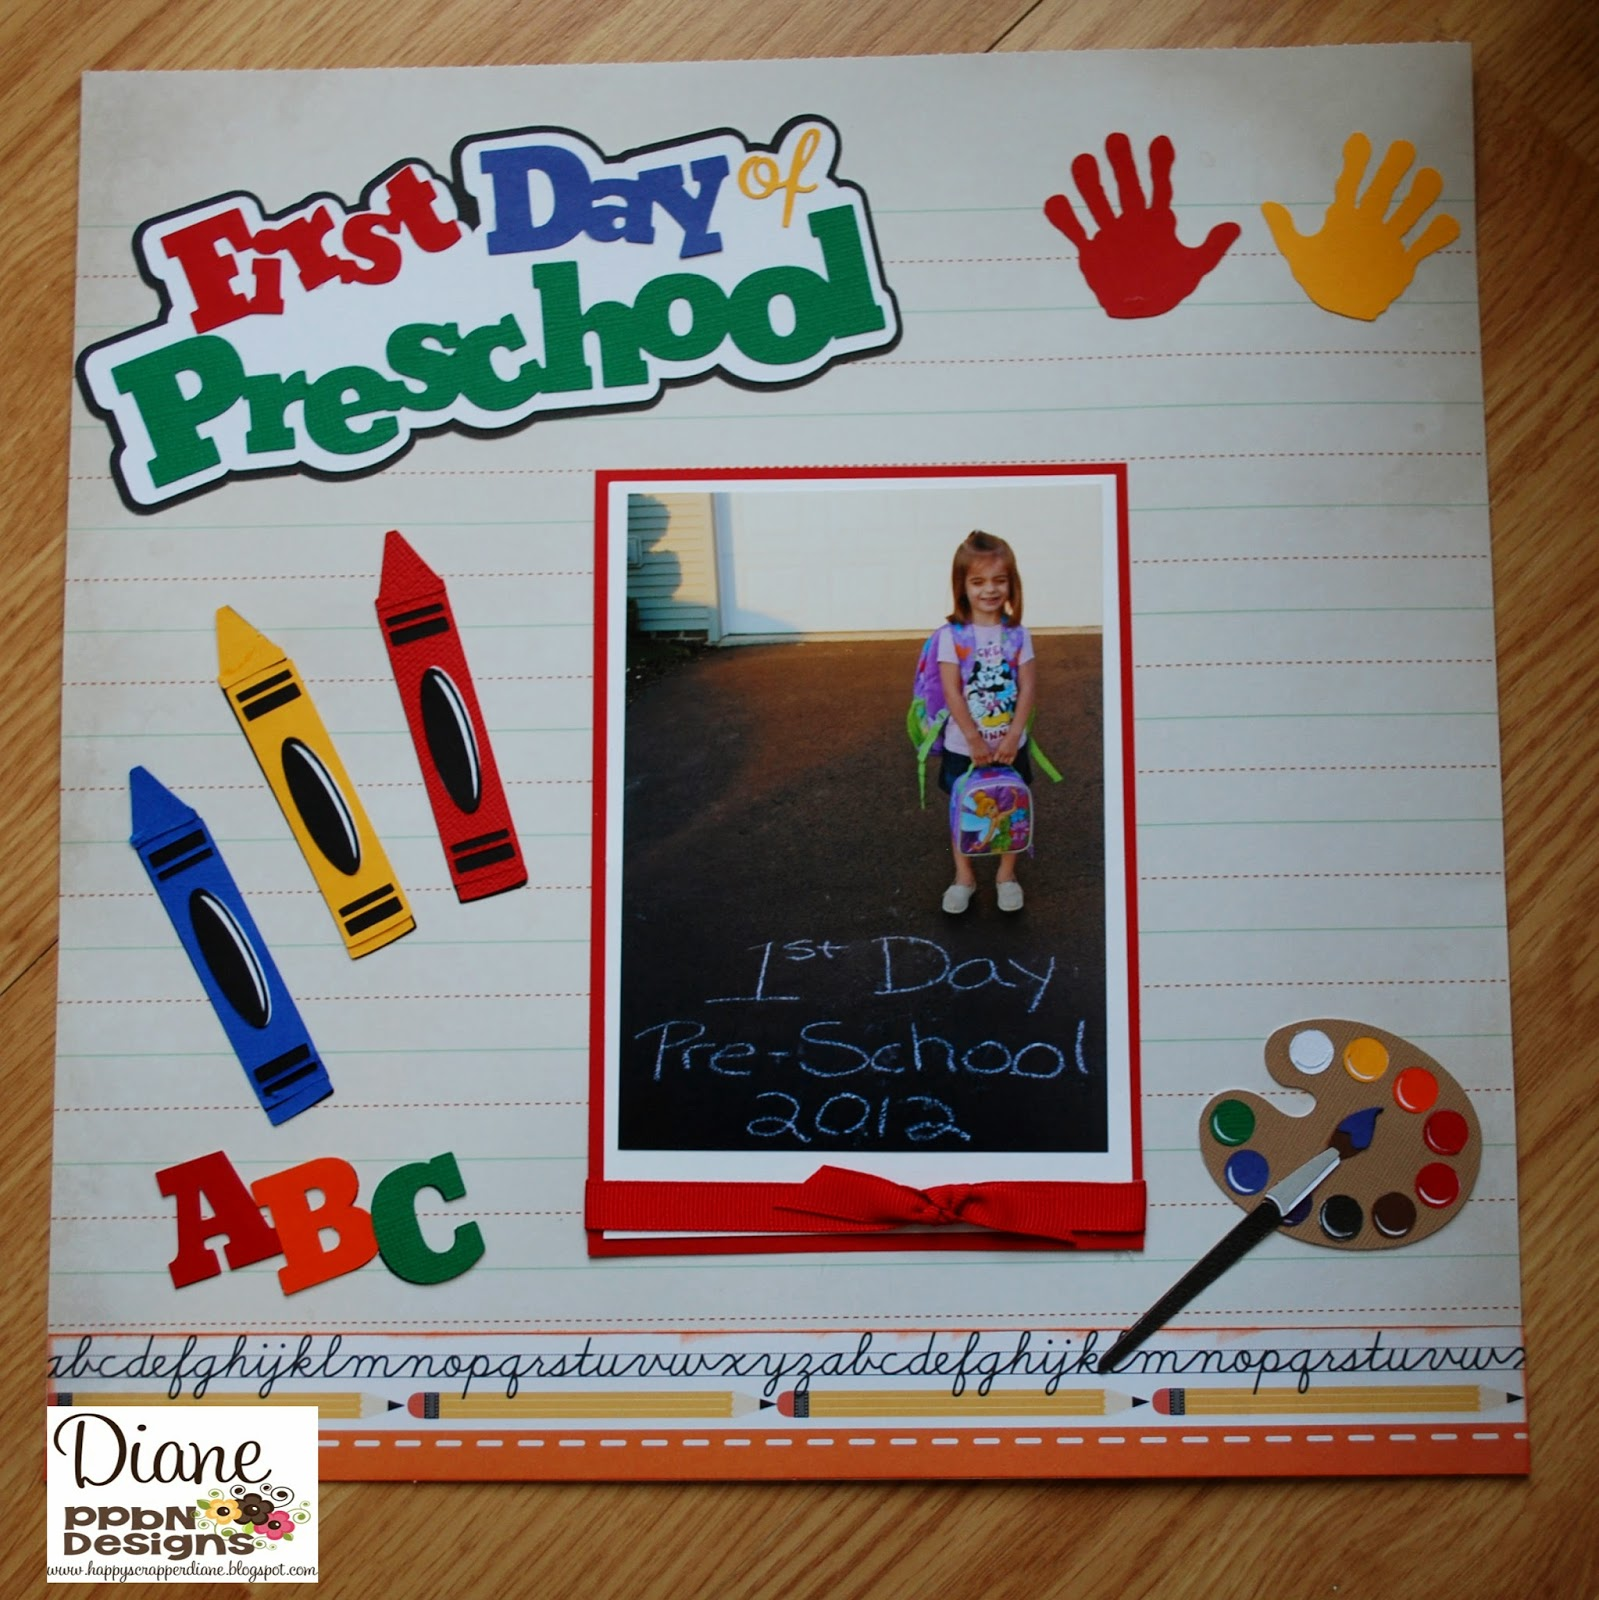 PPbN Designs Blog: First Day Of Preschool